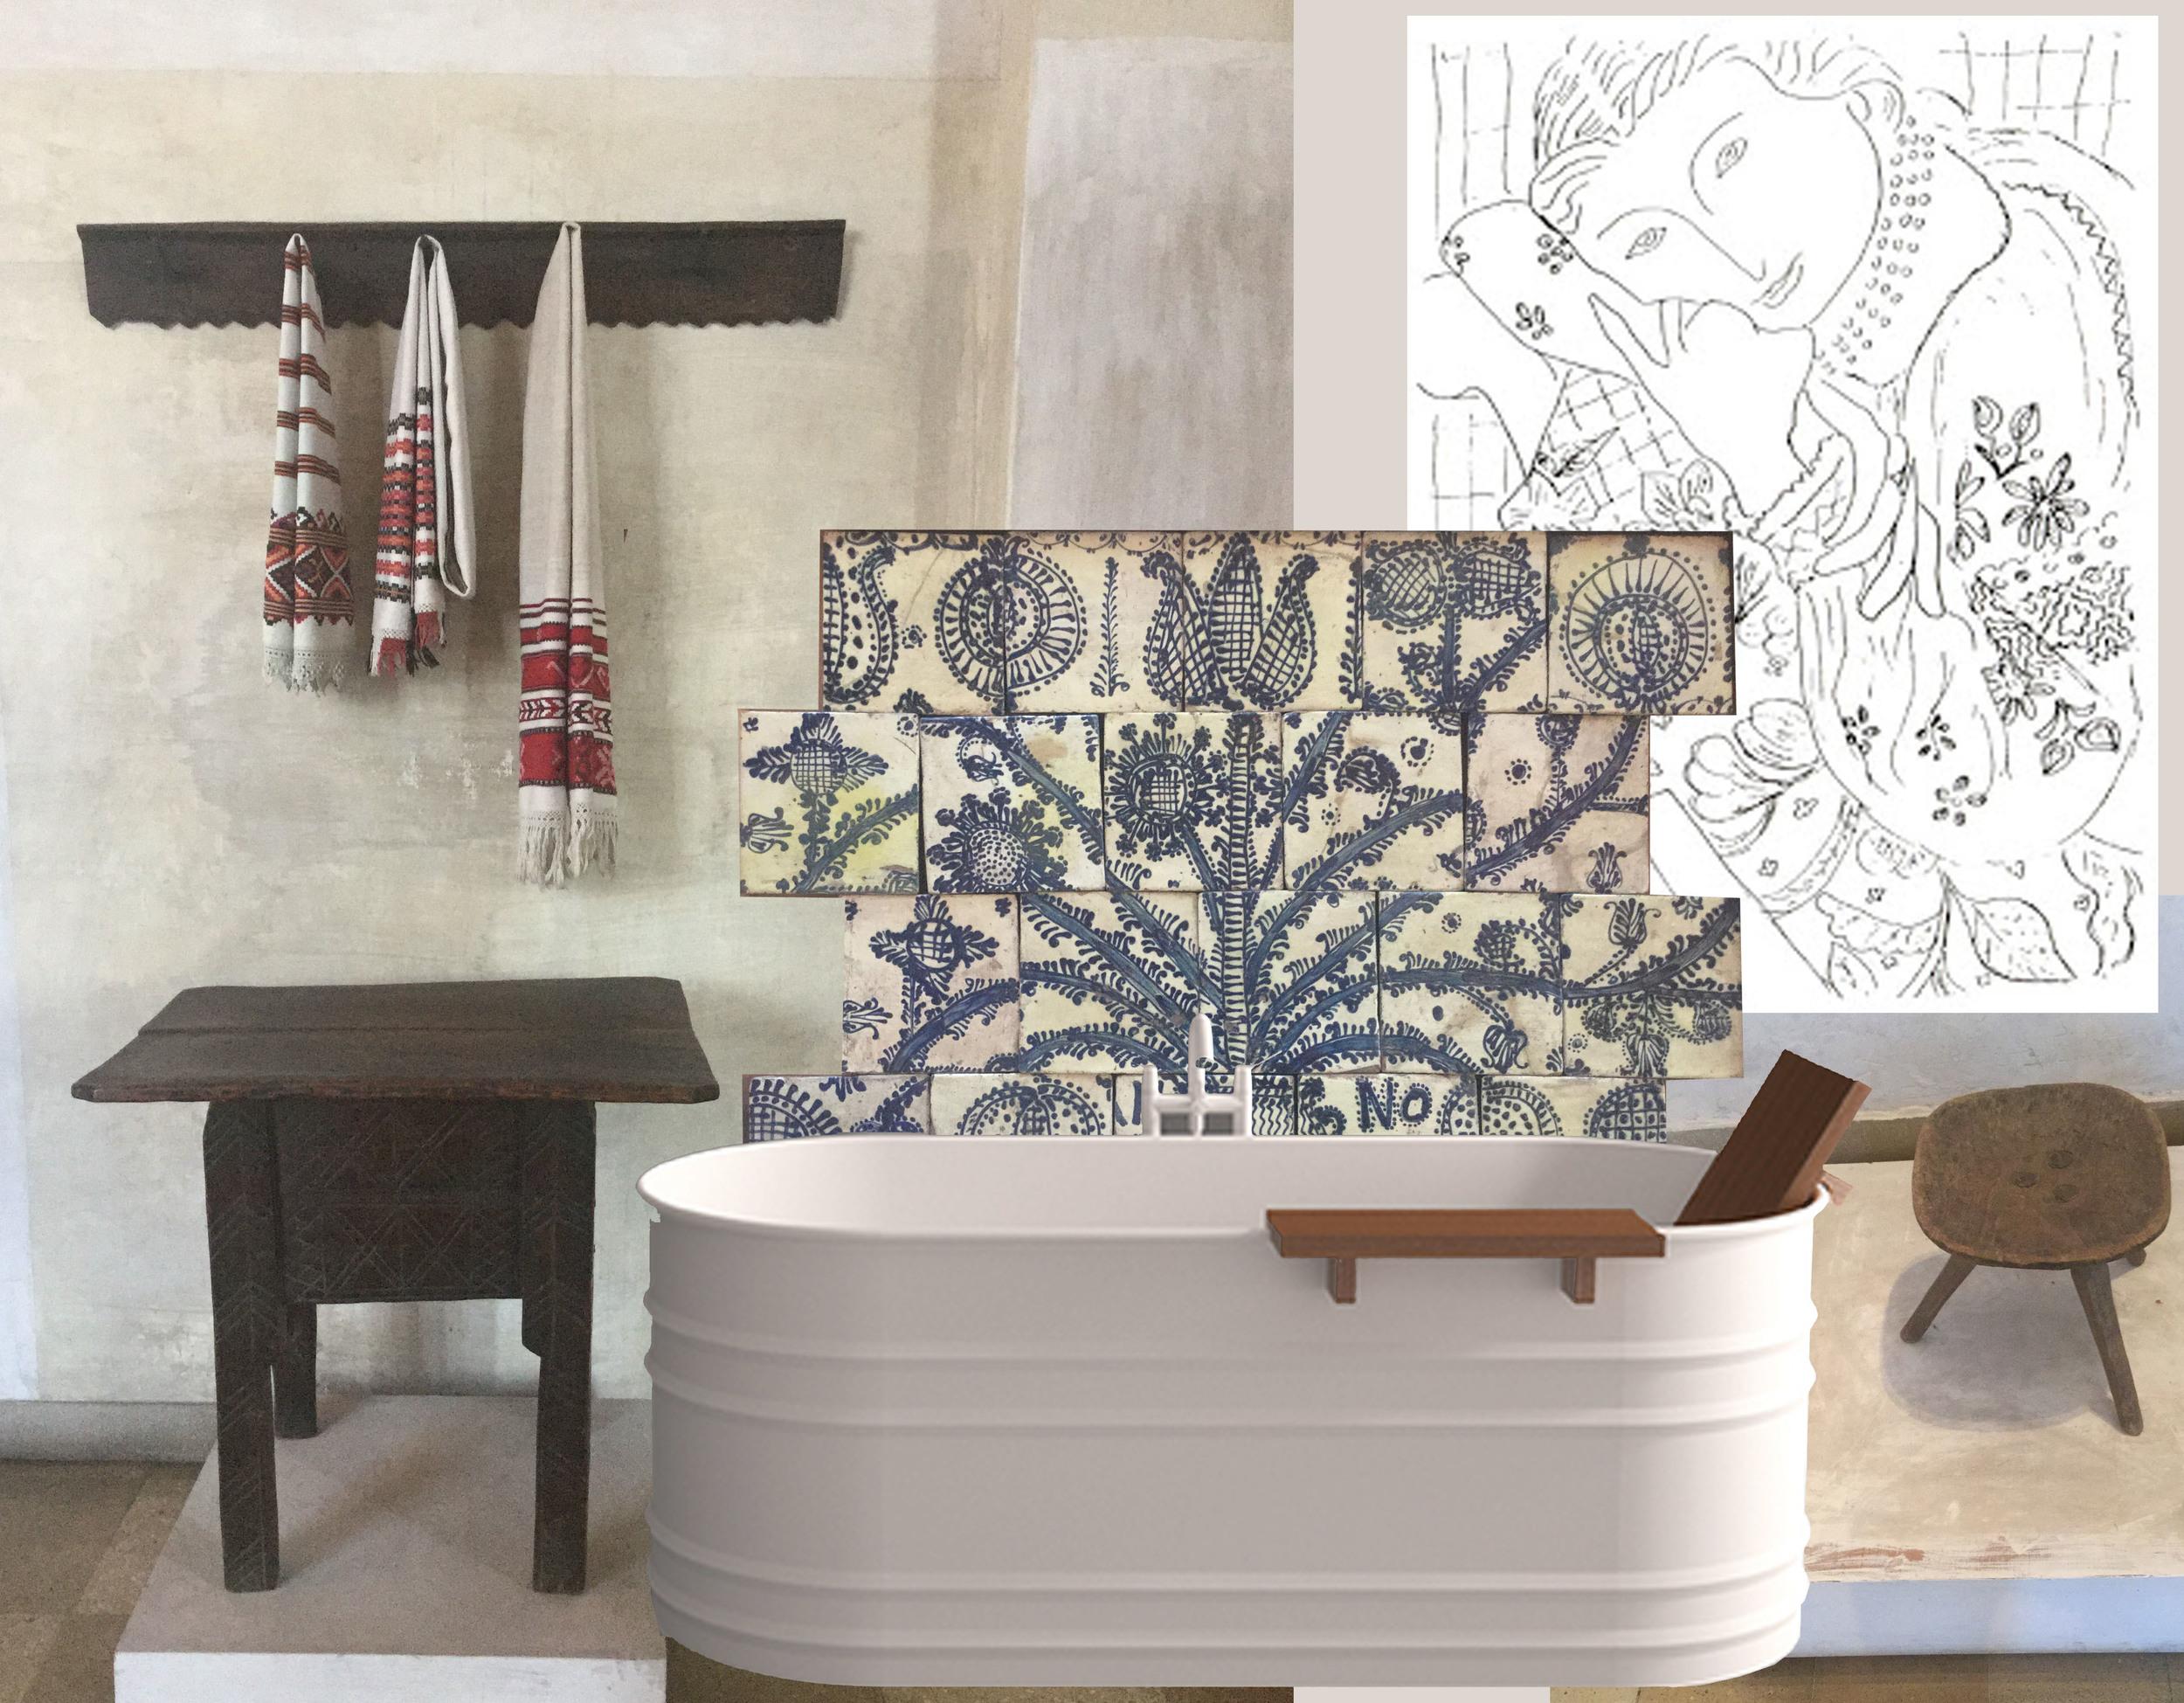 image towel rack - tiles Peasant Museum Bucharest - drawing Matisse - bathtub Vieques  Agape